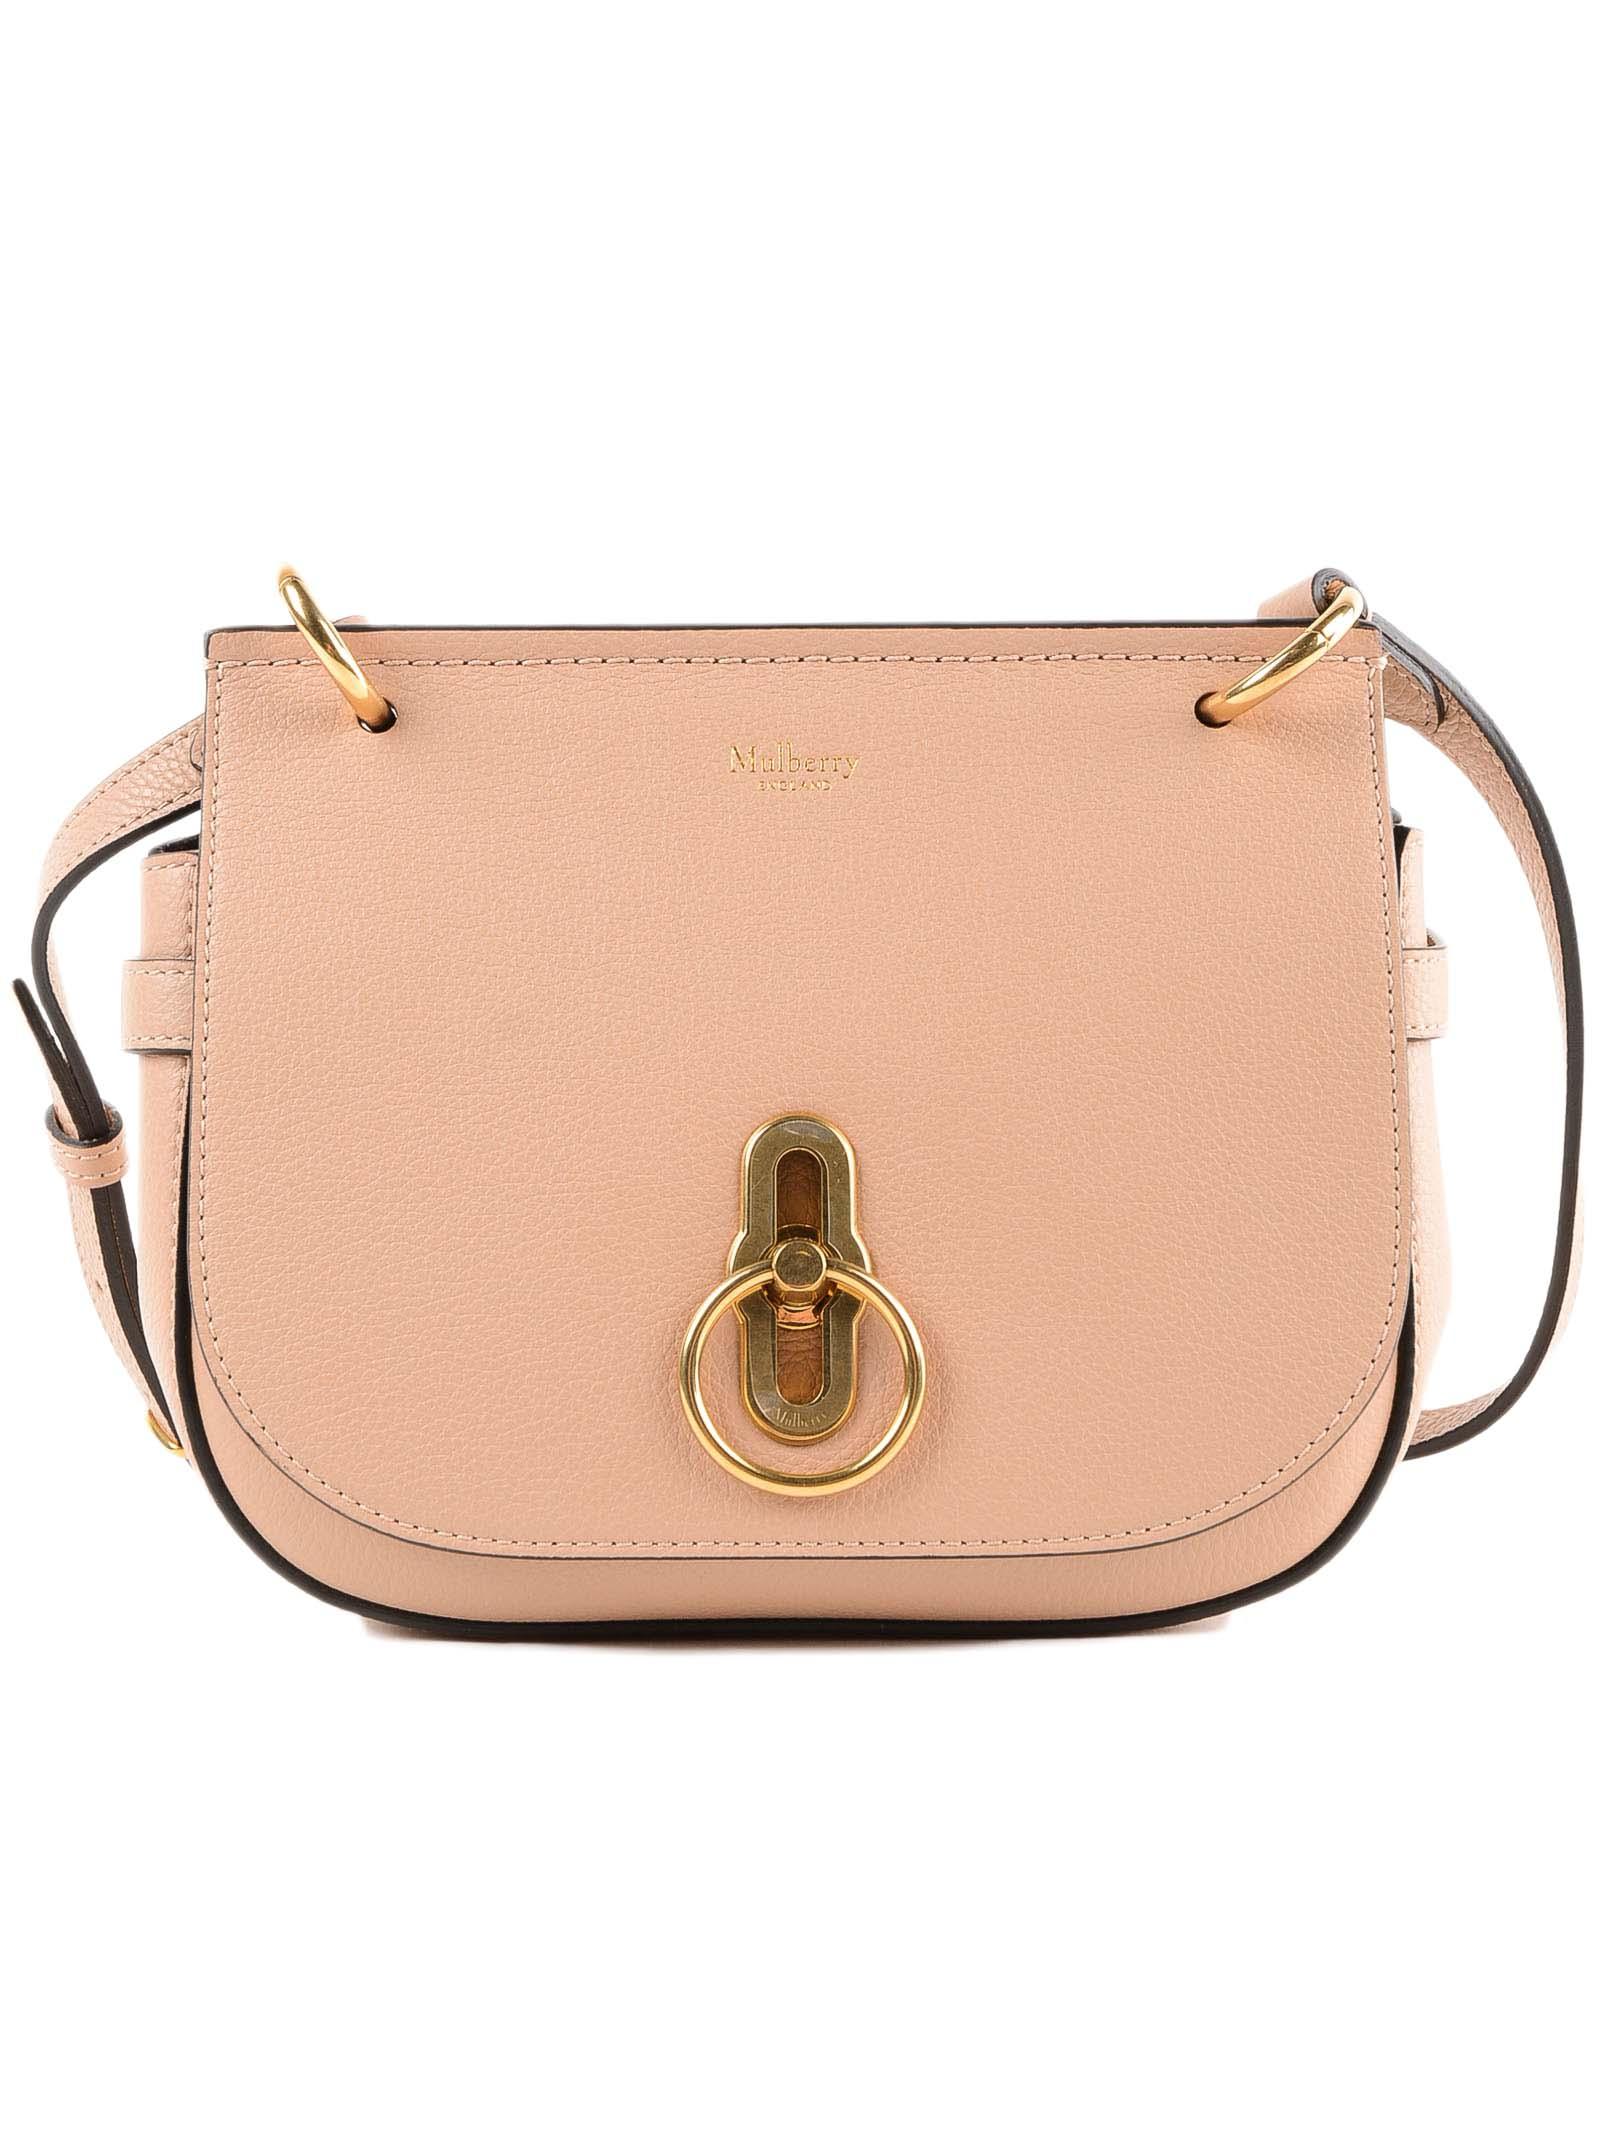 Small Amberley Shoulder Bag in Jrosewater